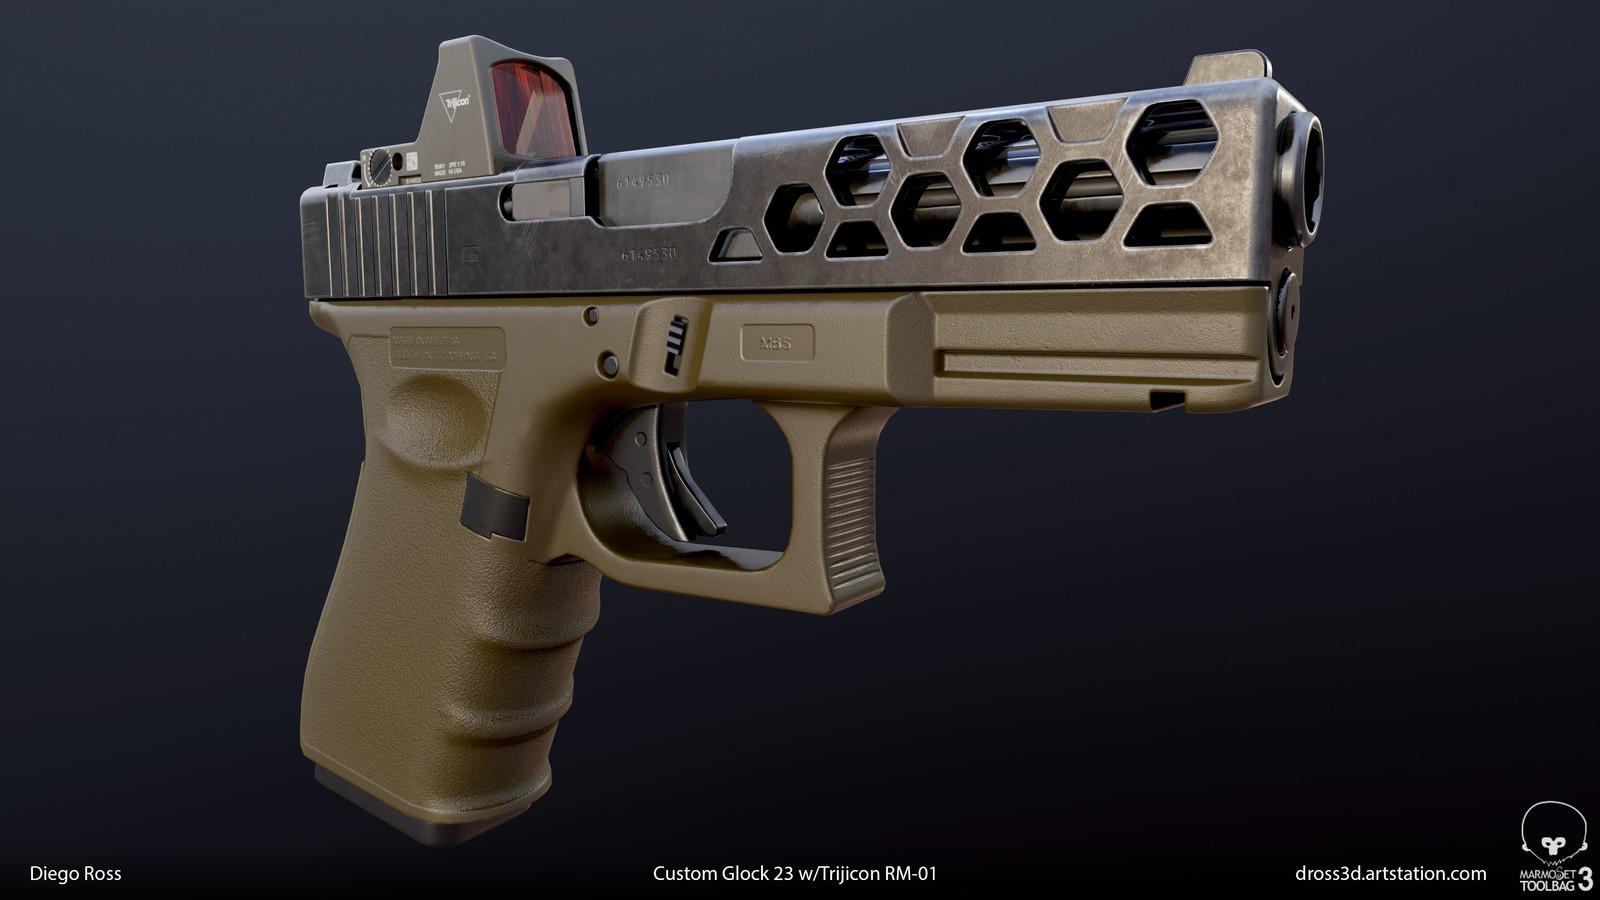 Custom Glock 23